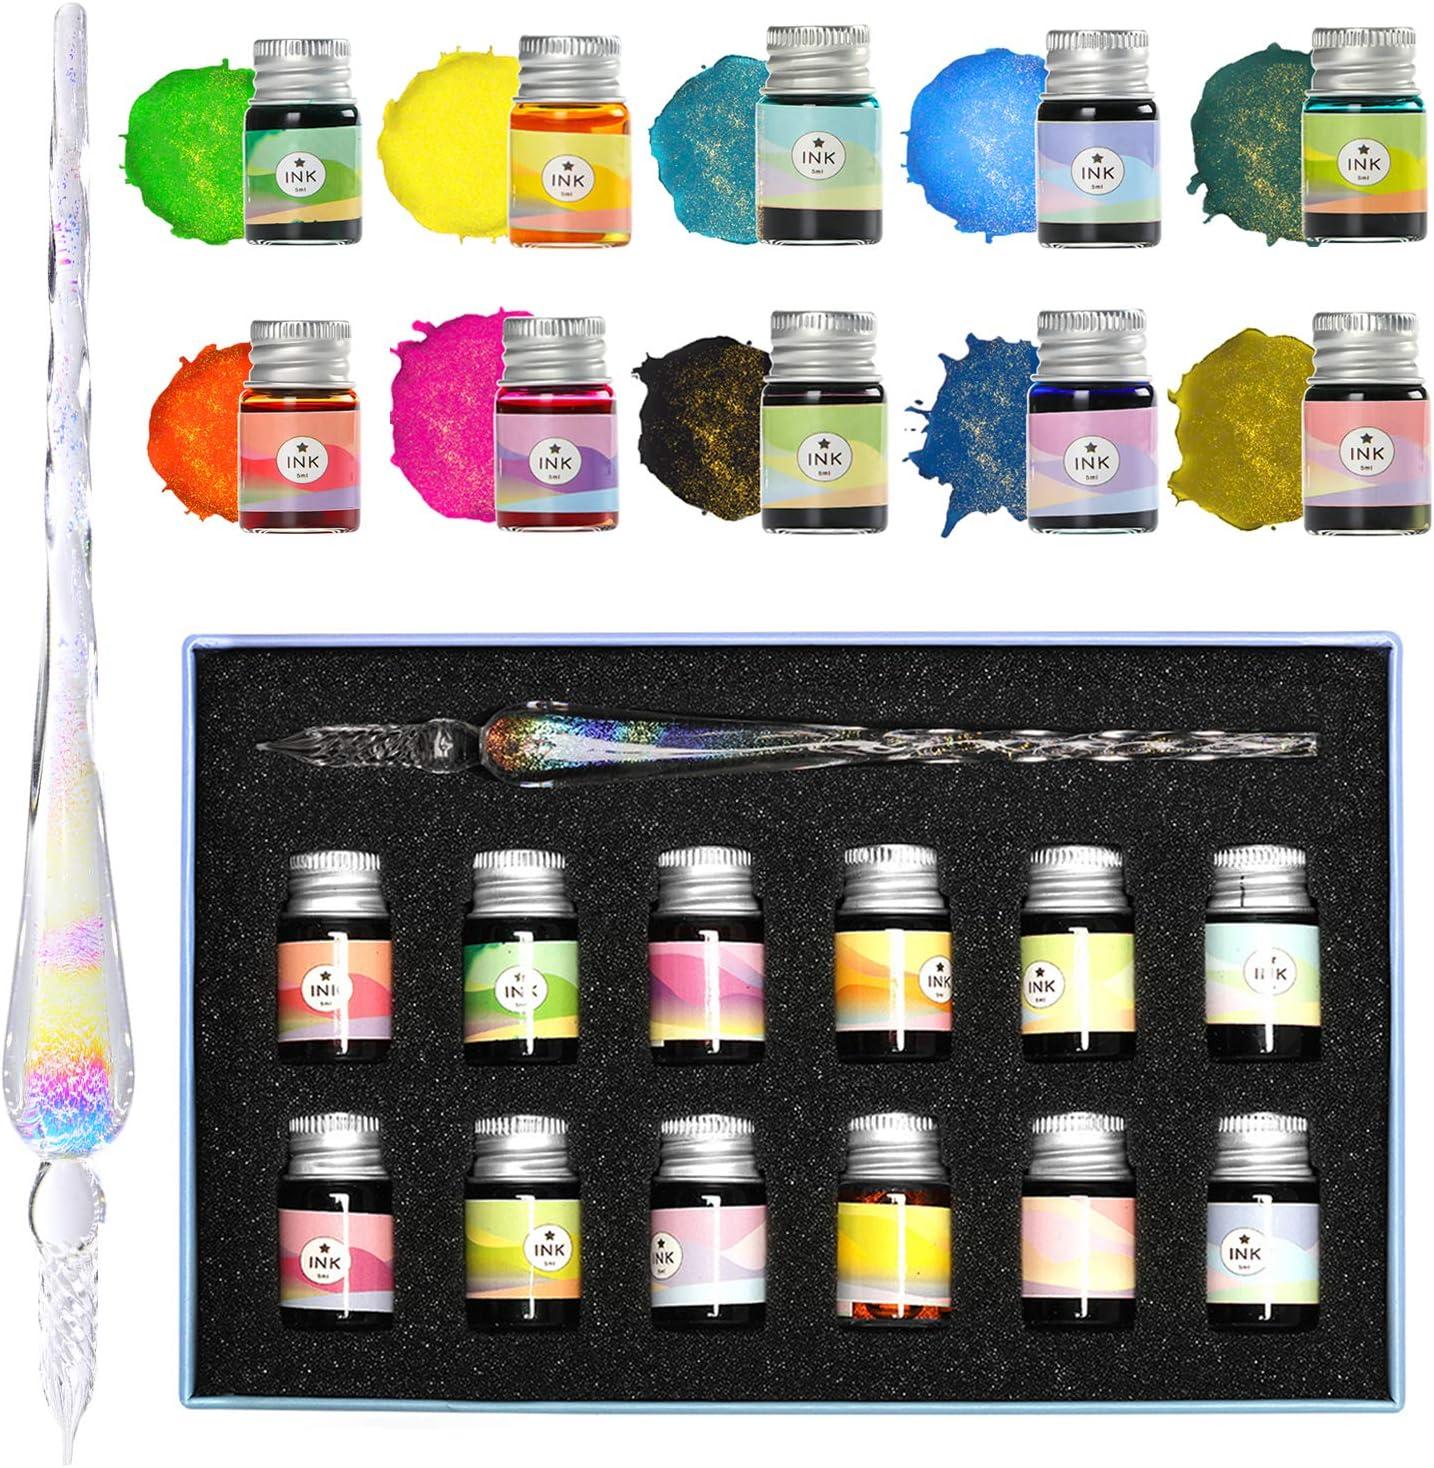 Kristall-Sternenhimmel Glas Ink Pen Glas Dip Pen Writing Fountain Pen-Set